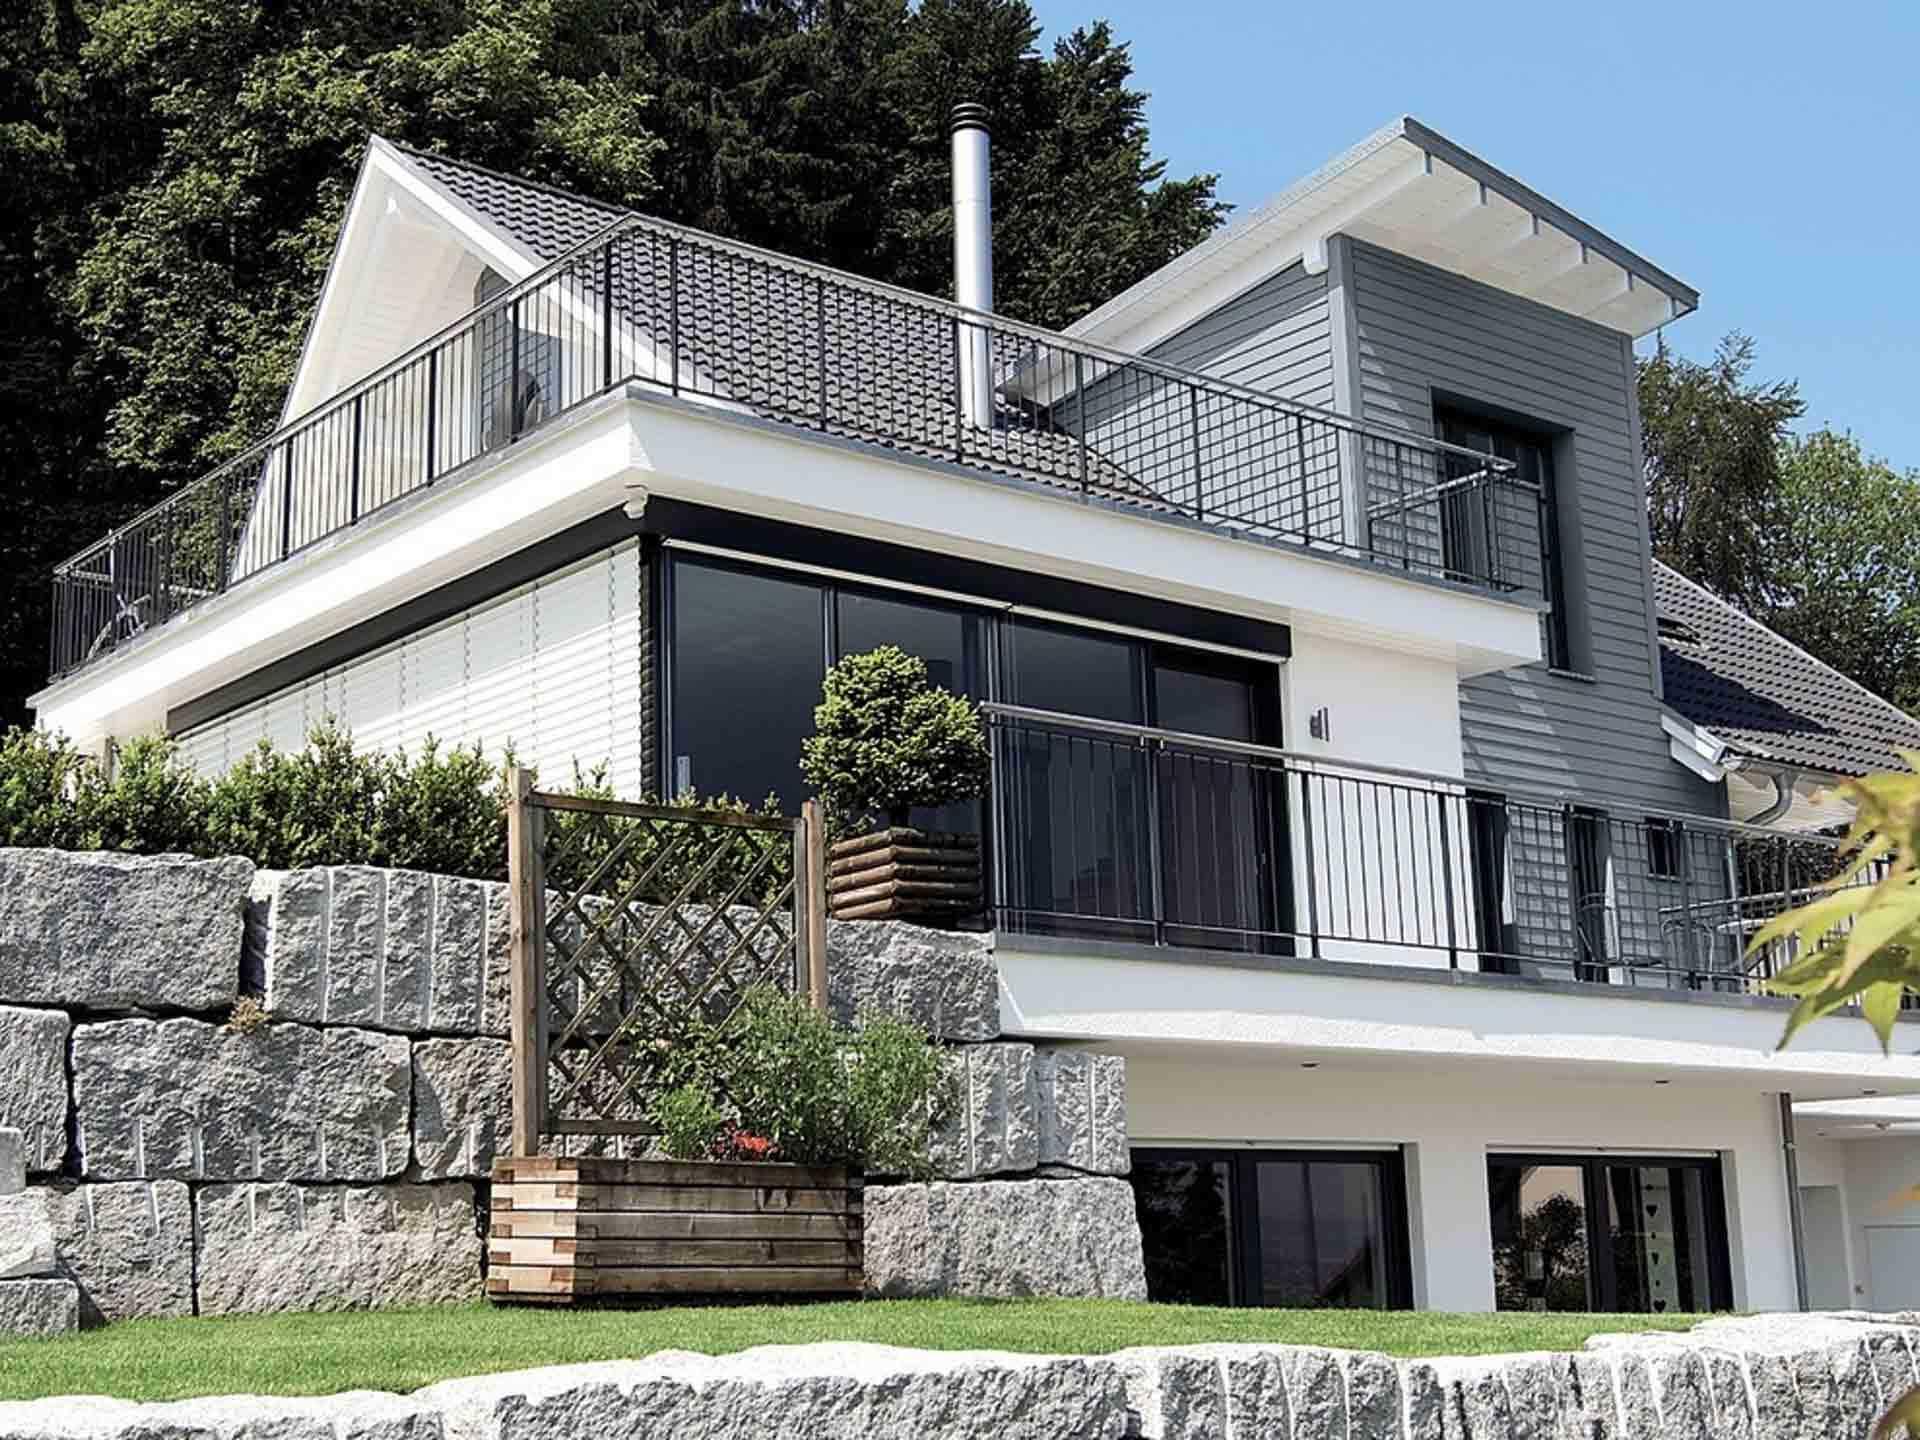 Einfamilienhaus mit Hanglage  WeberHaus  Musterhausnet